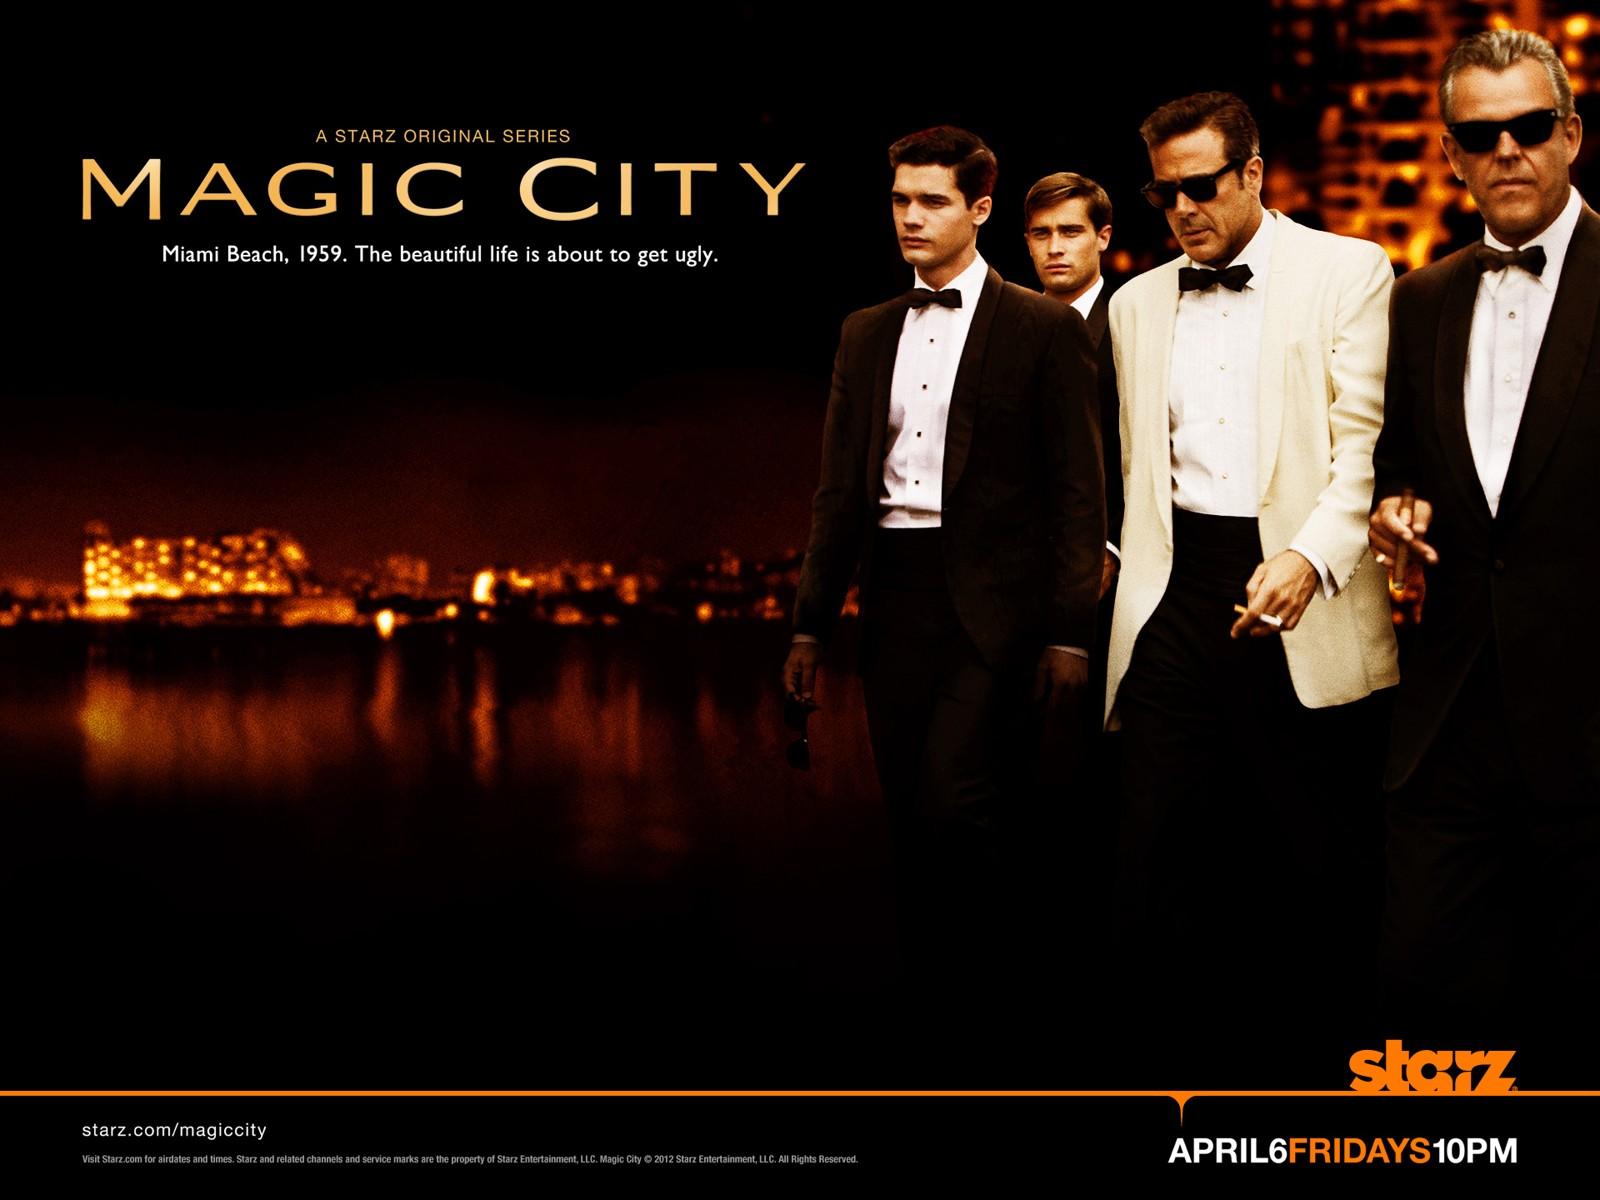 magic city starz - photo #4